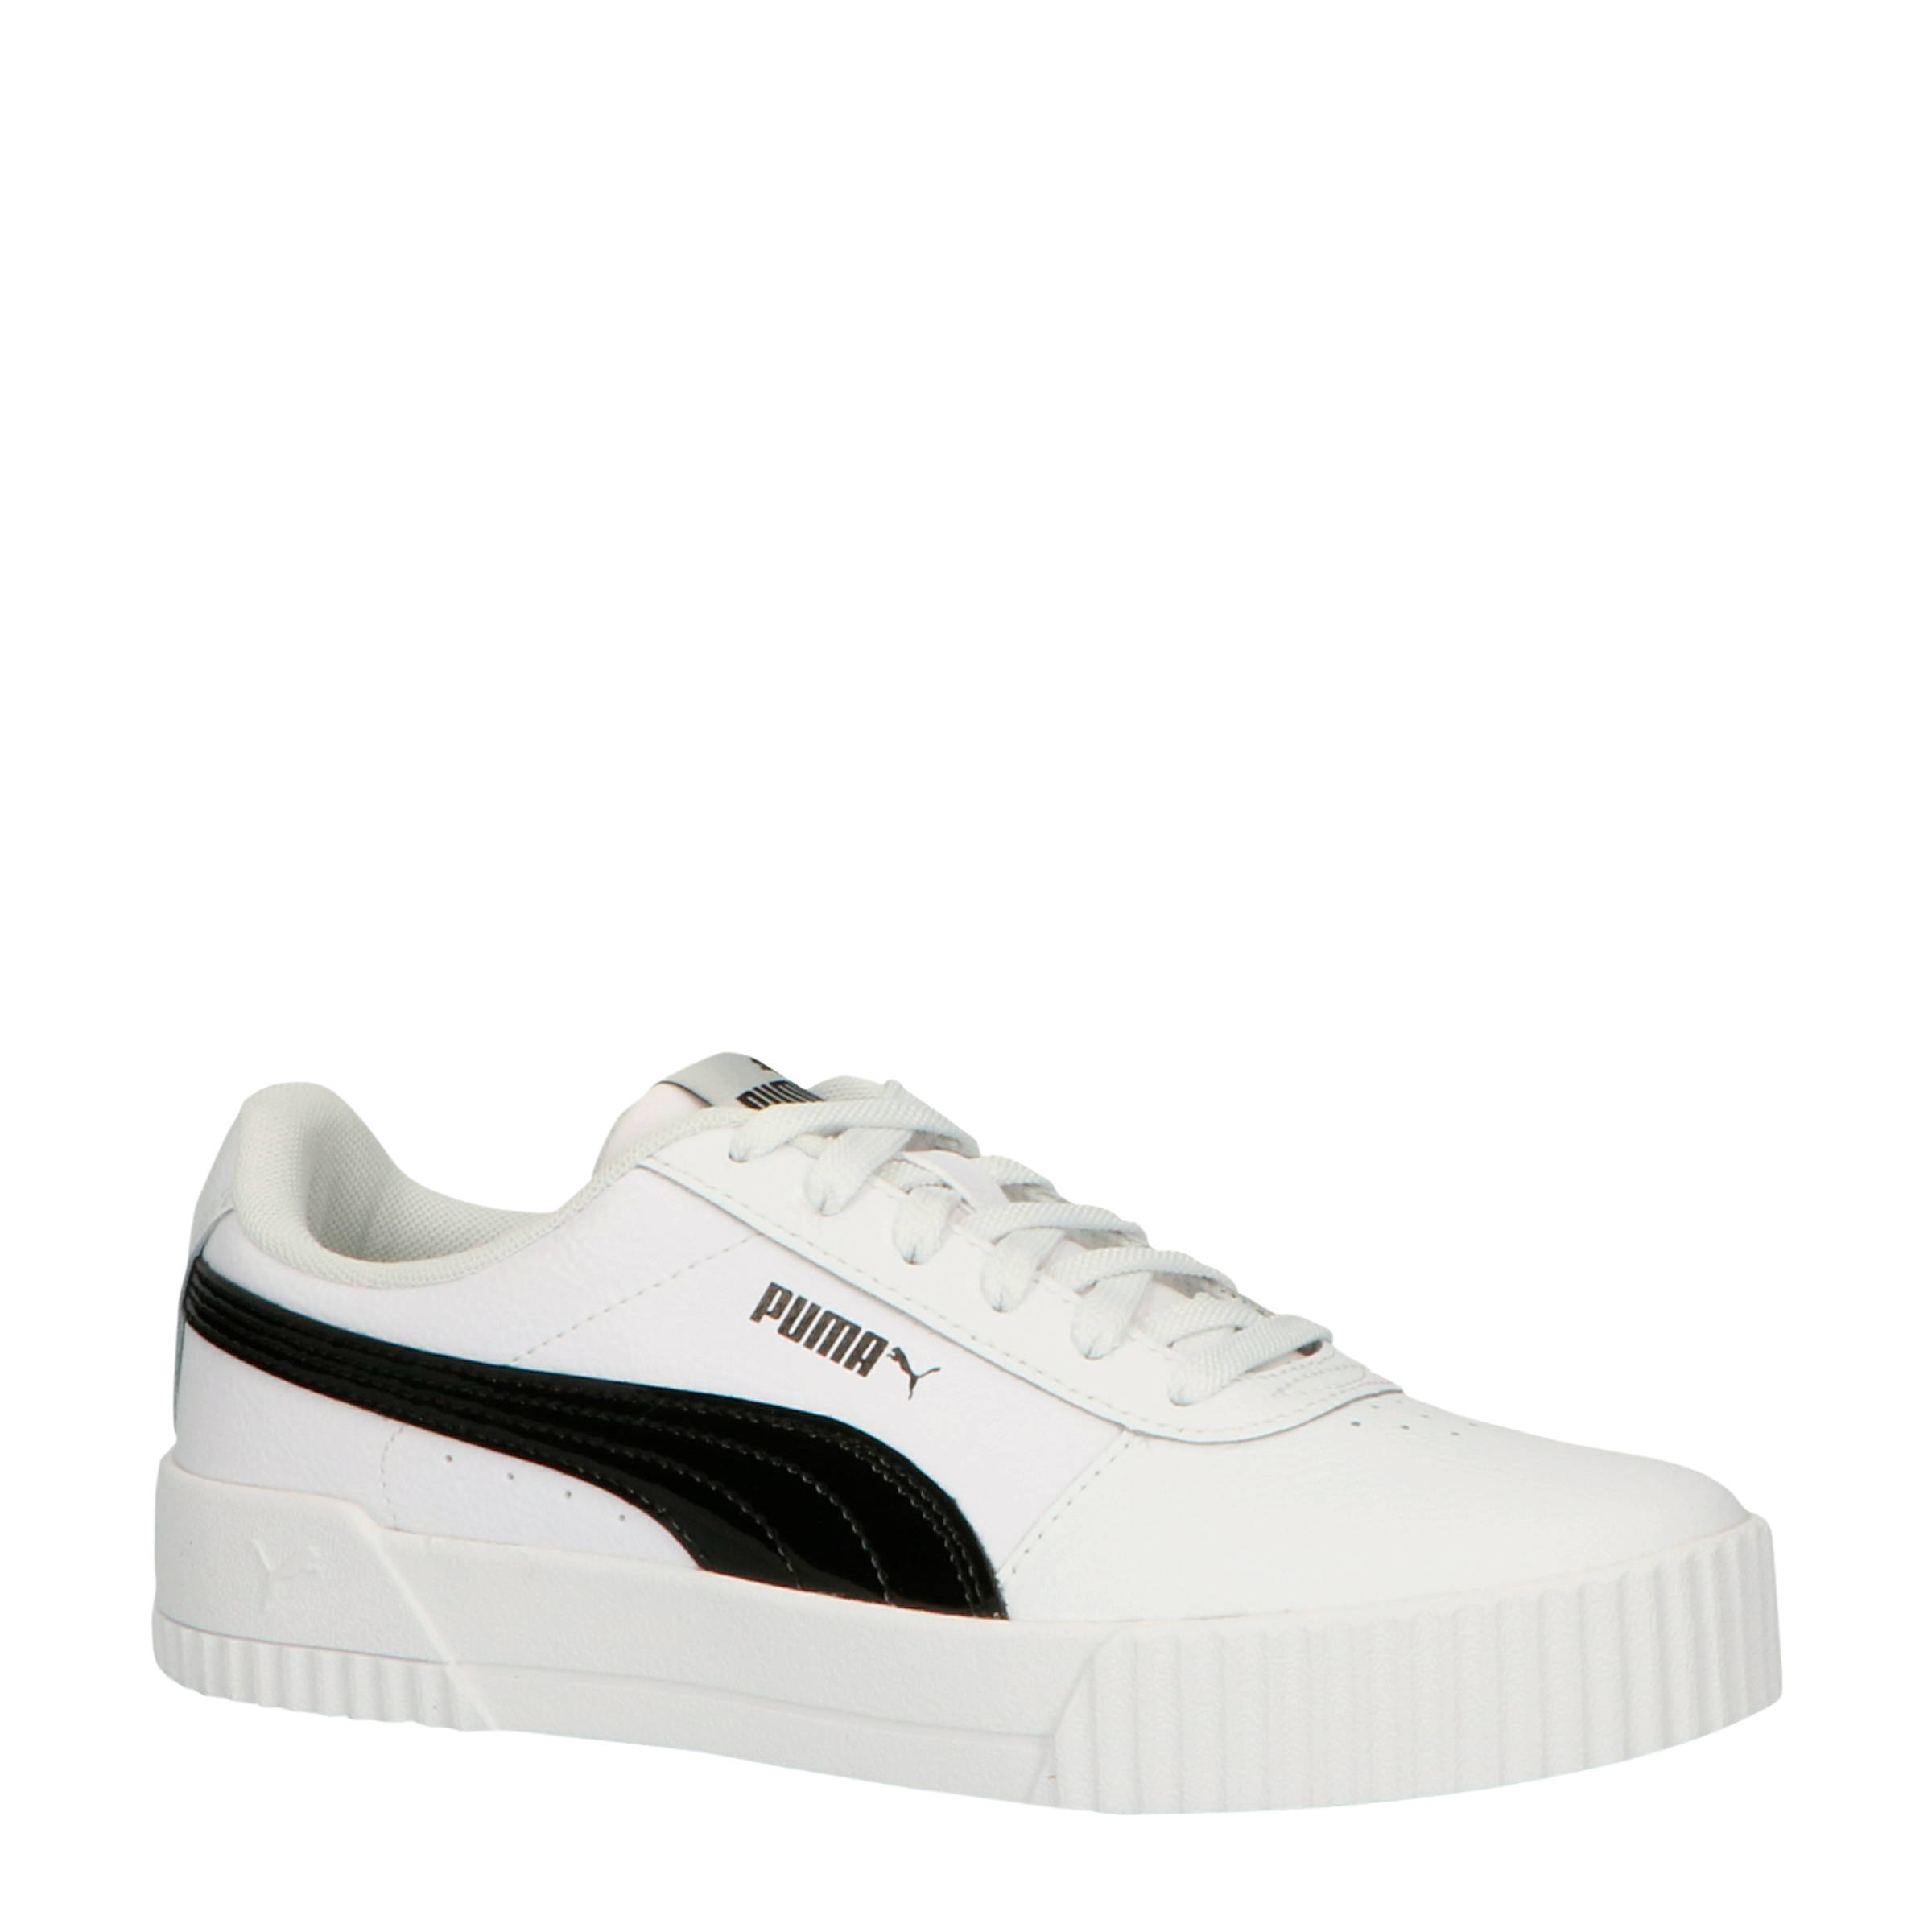 Carina sneakers wit/zwart